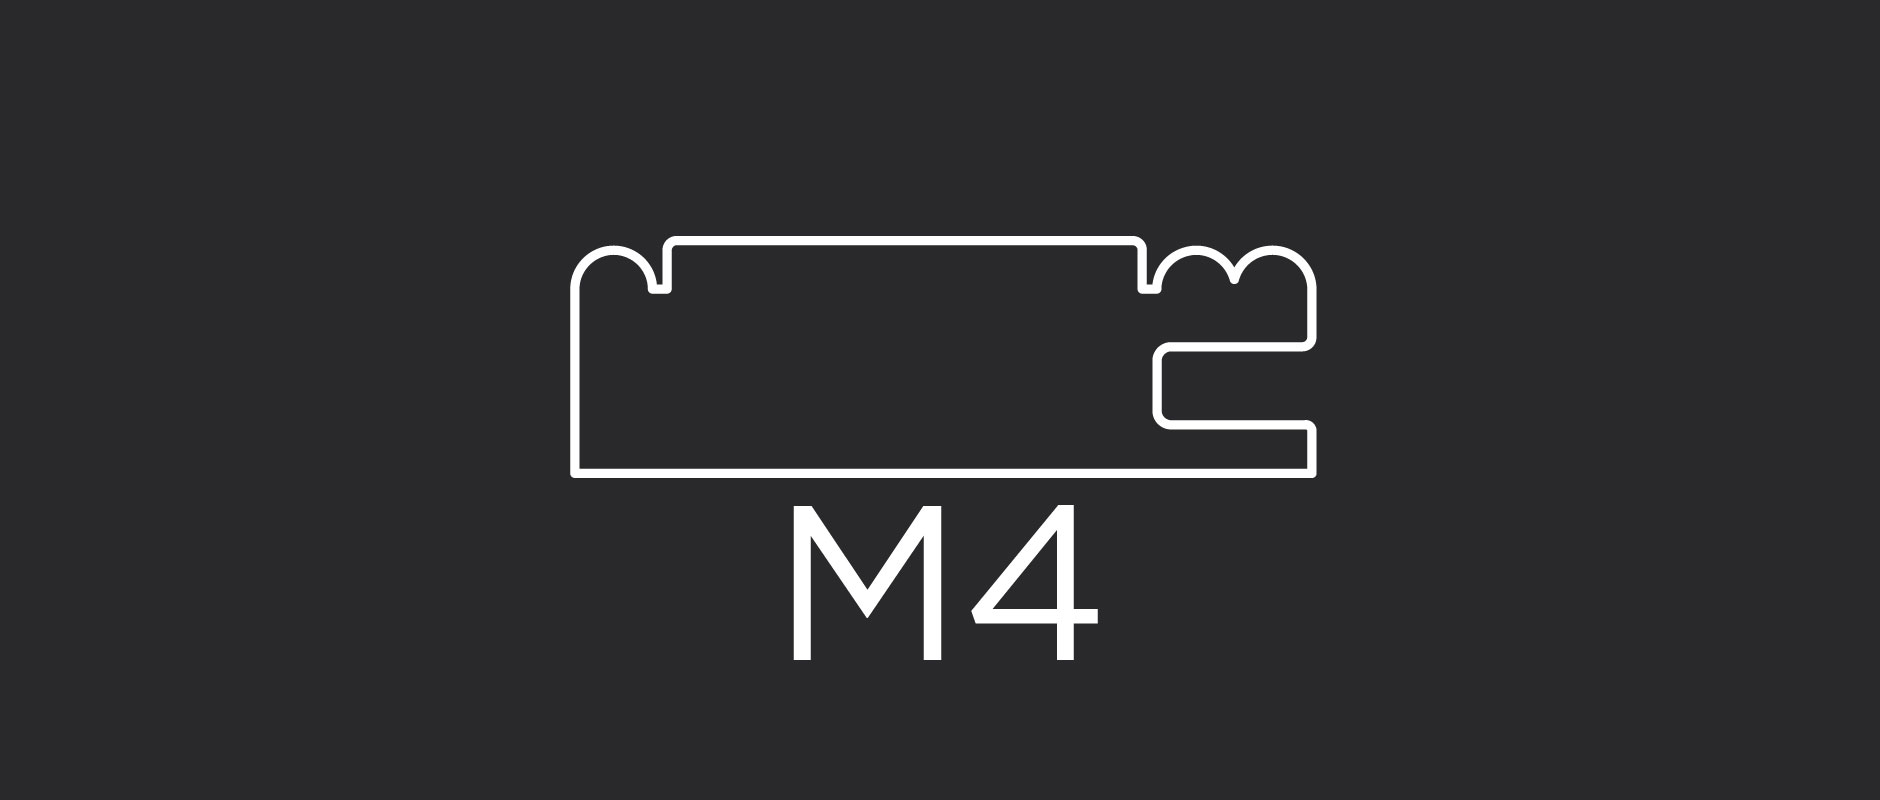 "M4 mitered frame profile 2-3/8"" wide"